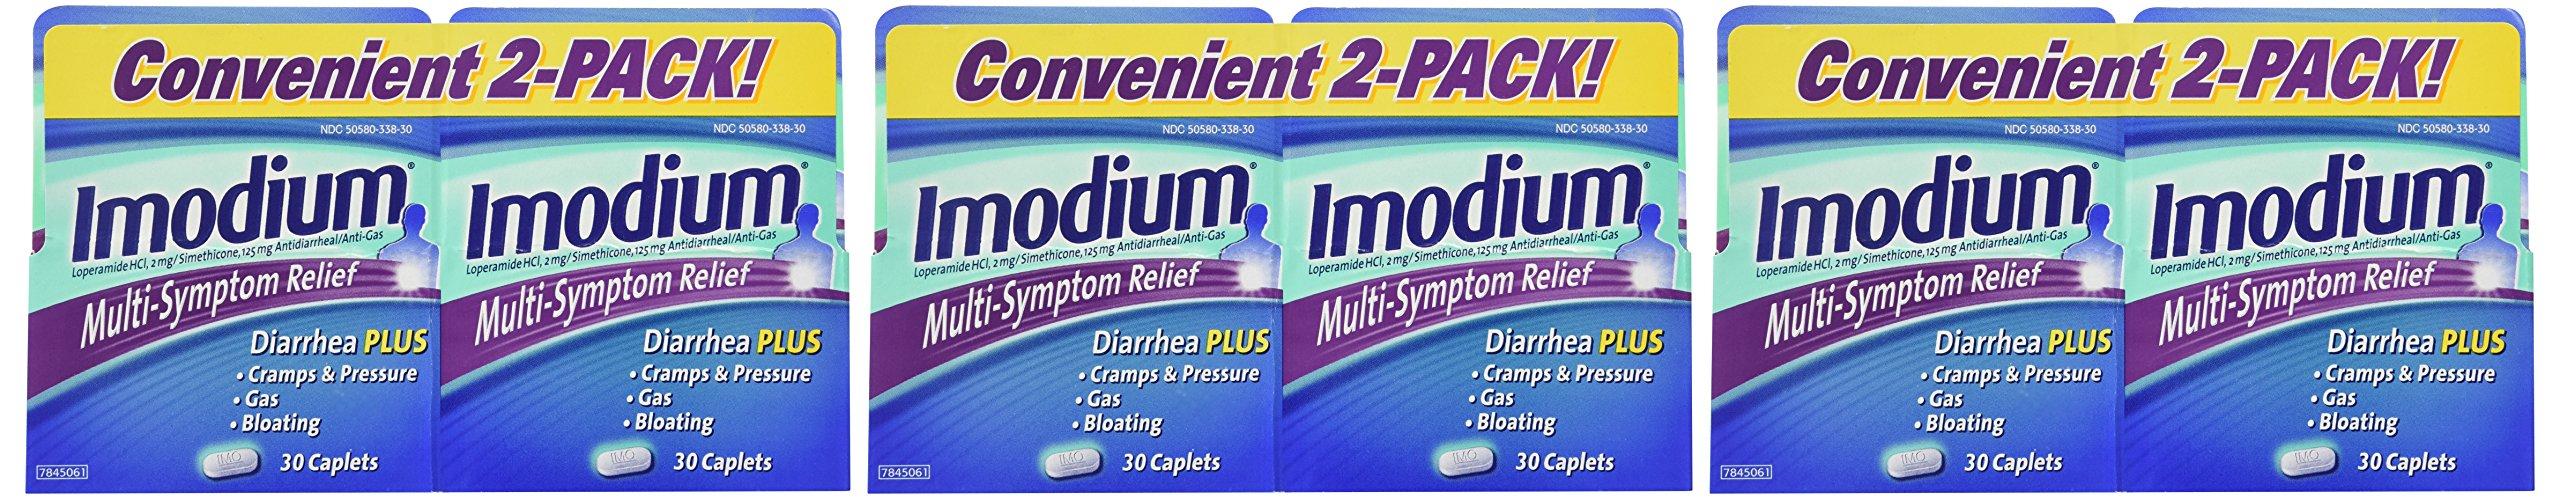 Imodium Multi-Symptom Relief - 6 Pack (30 count each), Total = 180 Count